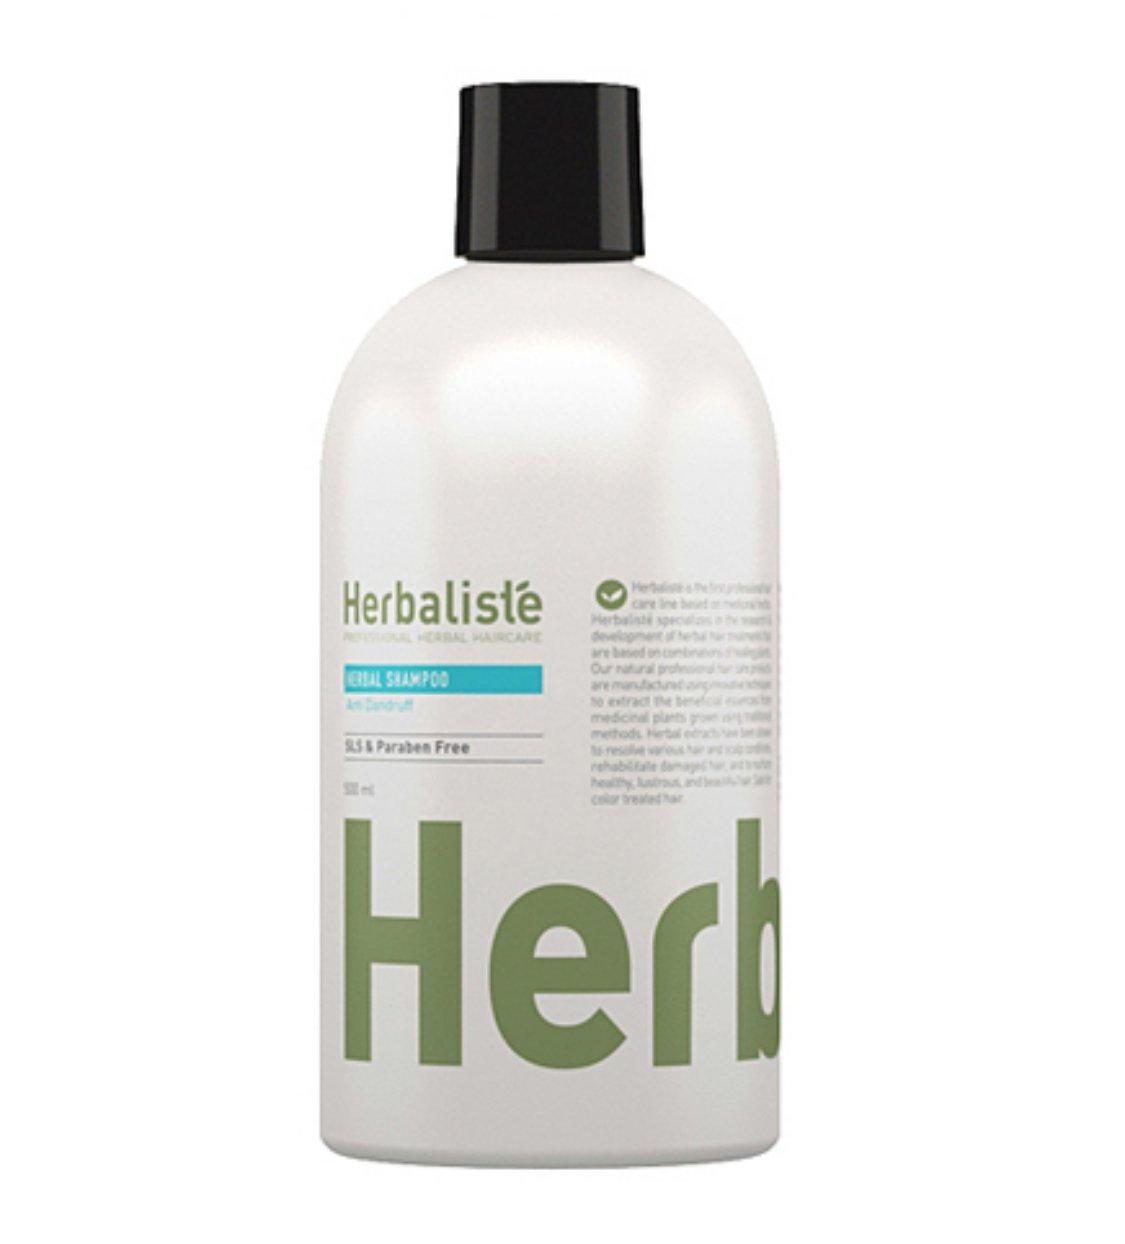 Herbaliste Hair Shampoo/Herbal Anti-Dndruff Shampoo